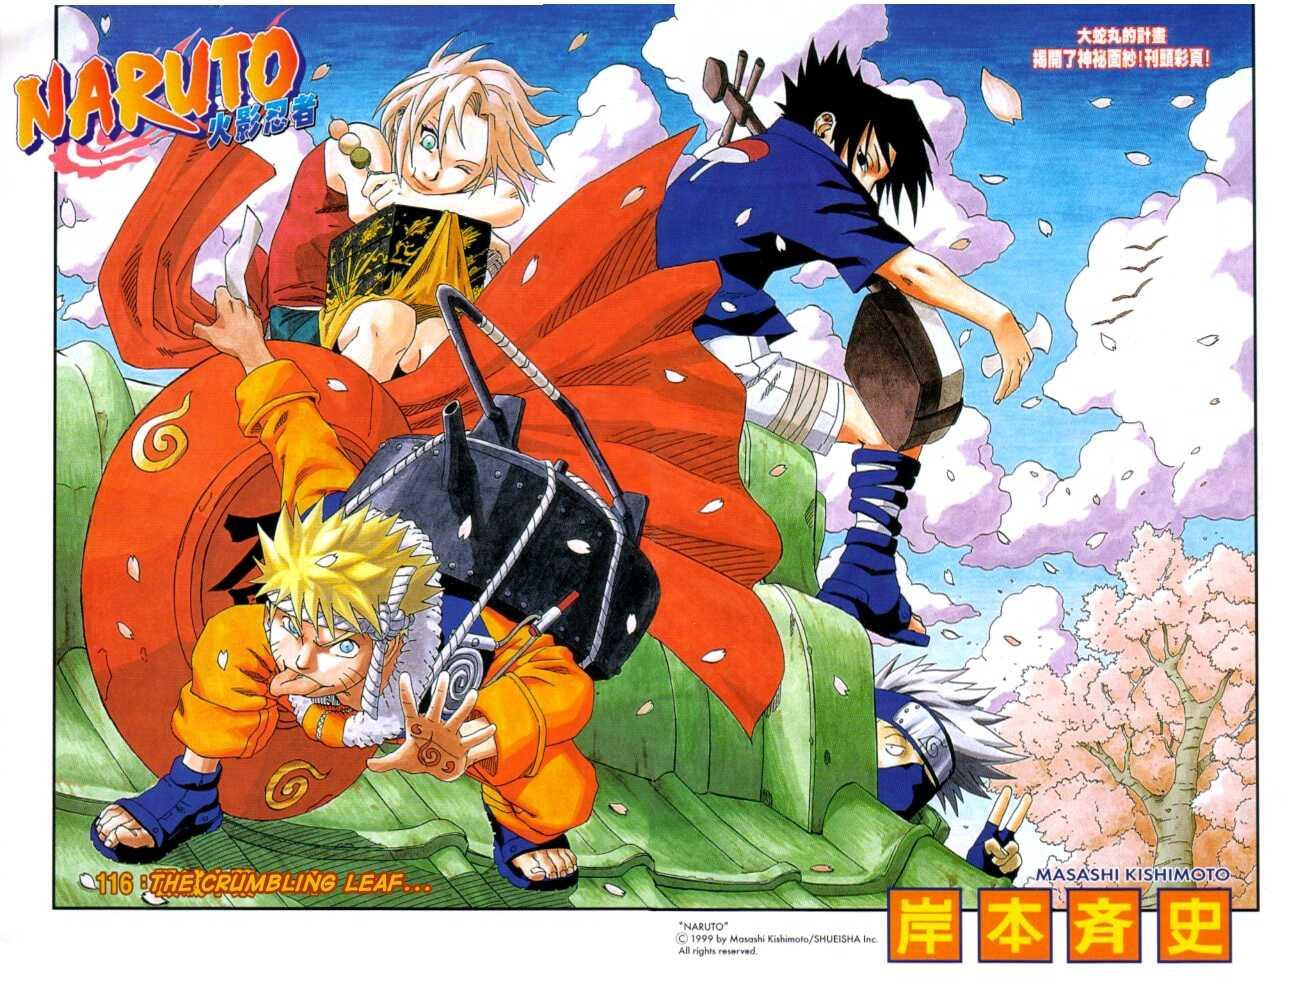 https://im.nineanime.com/comics/pic9/33/289/22368/Naruto1160994.jpg Page 1